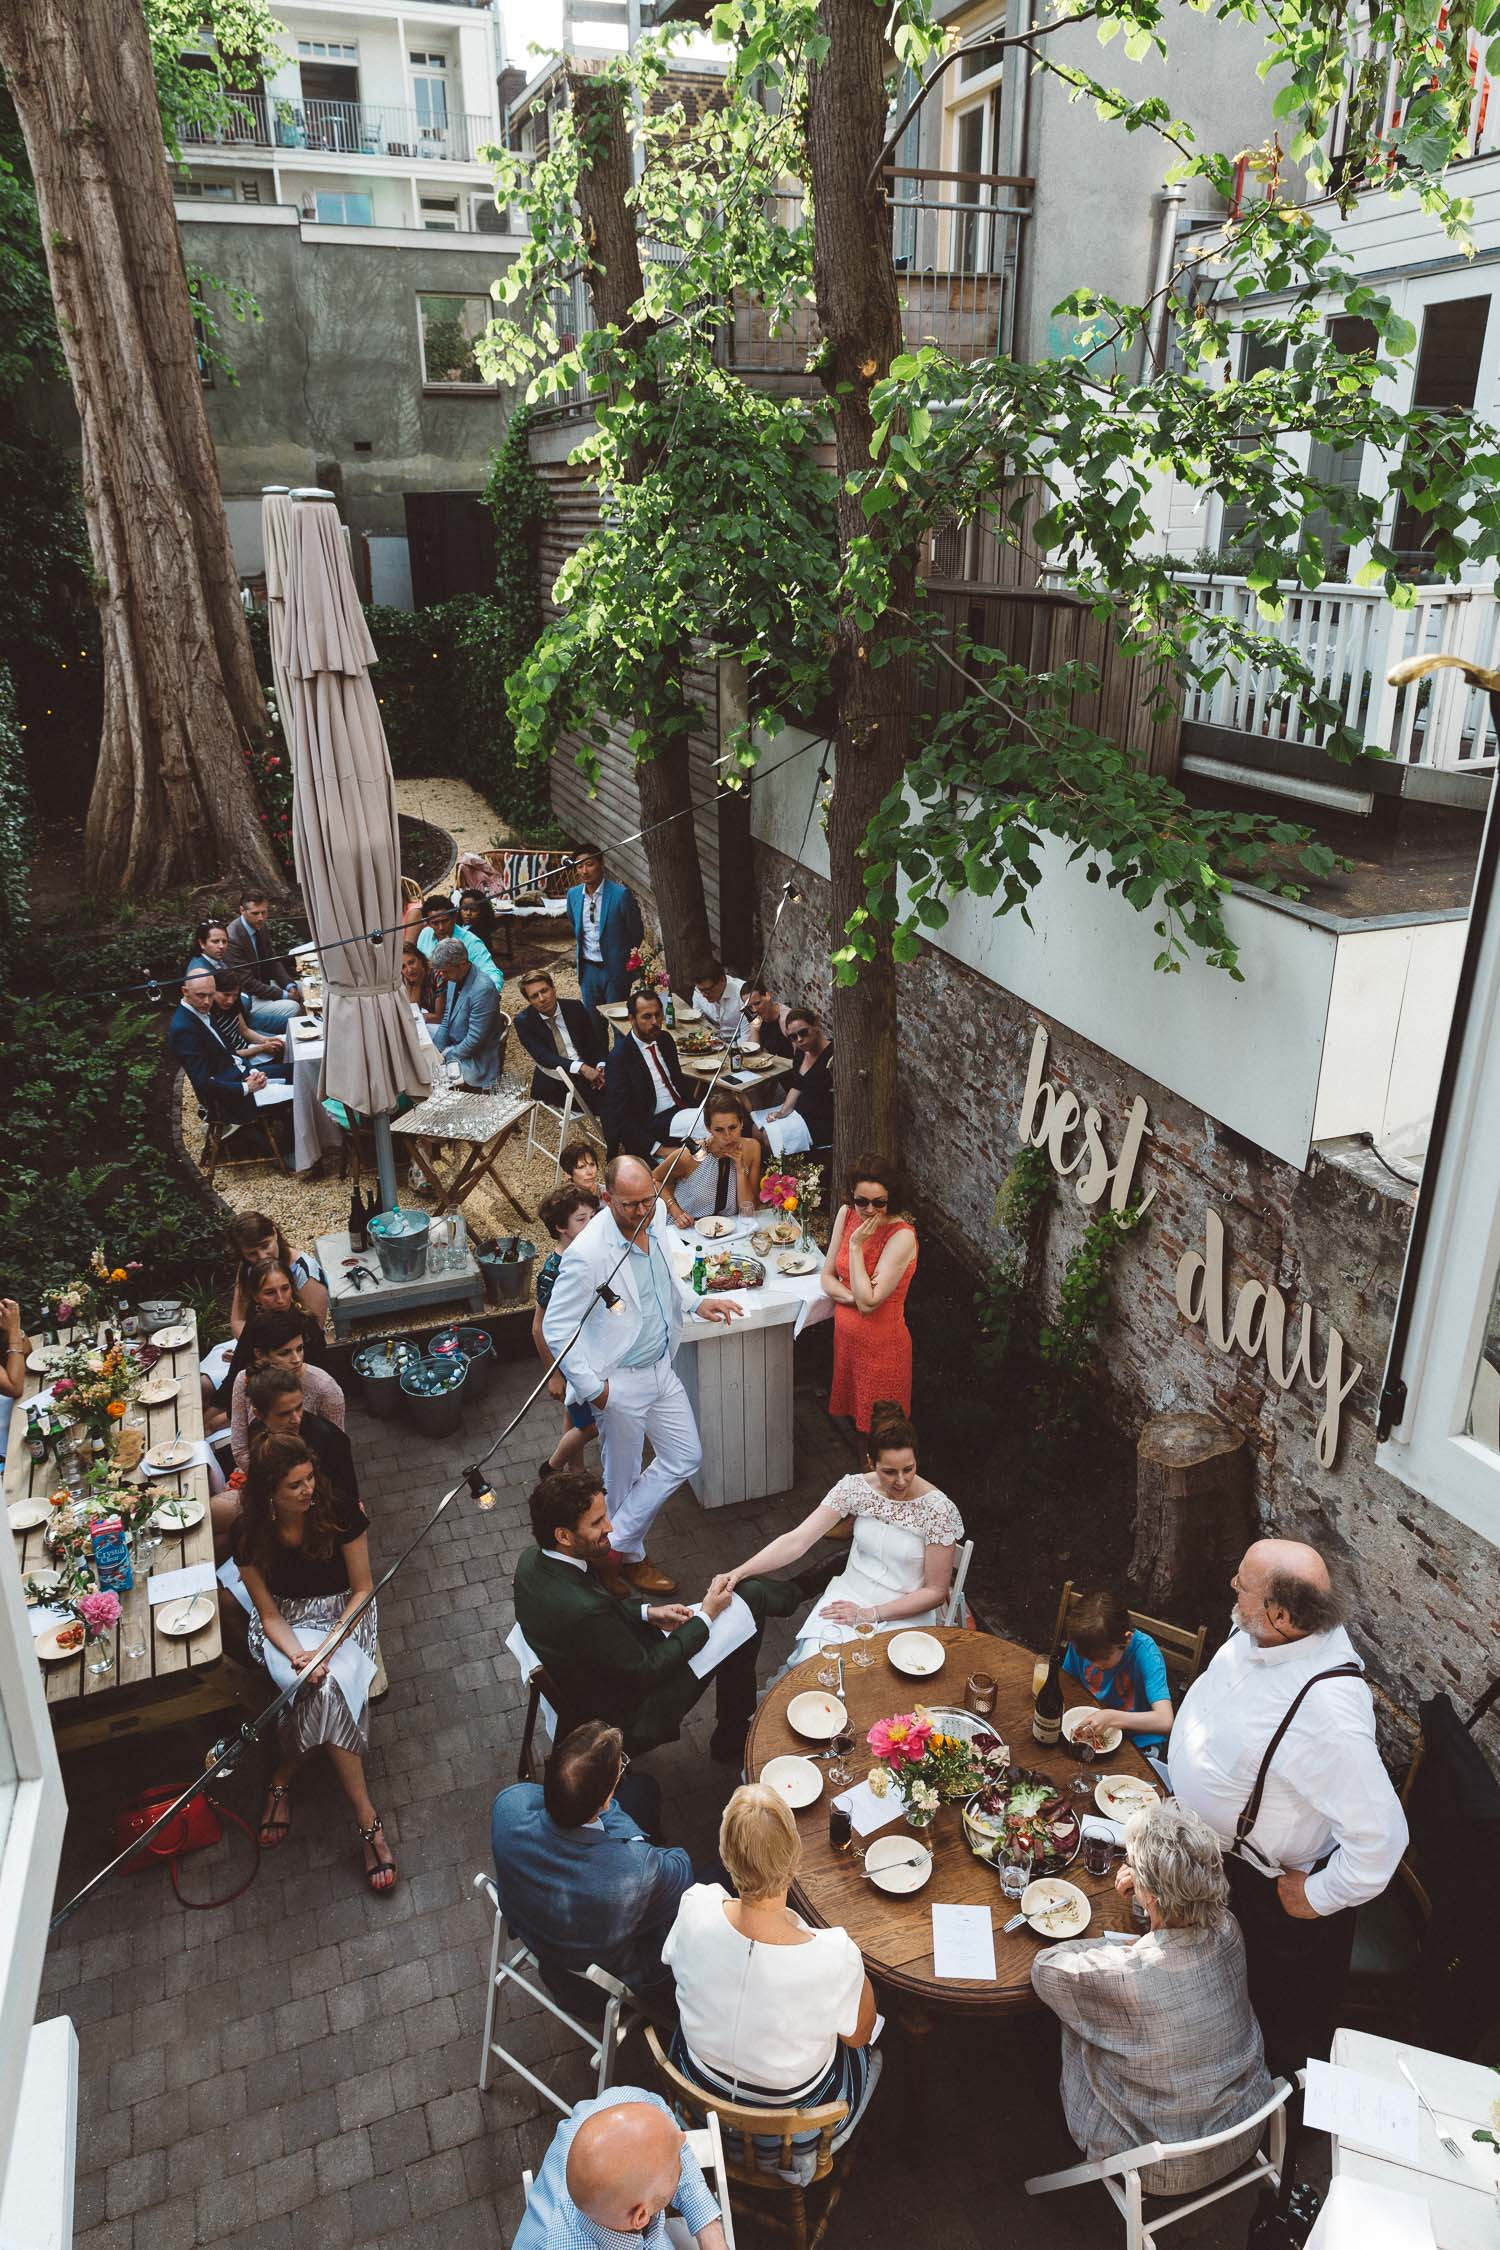 Backyard-wedding-Bruiloft-Annemiek-David-fotografie-photography-On-a-hazy-morning-Amsterdam-The-Netherlands435.jpg